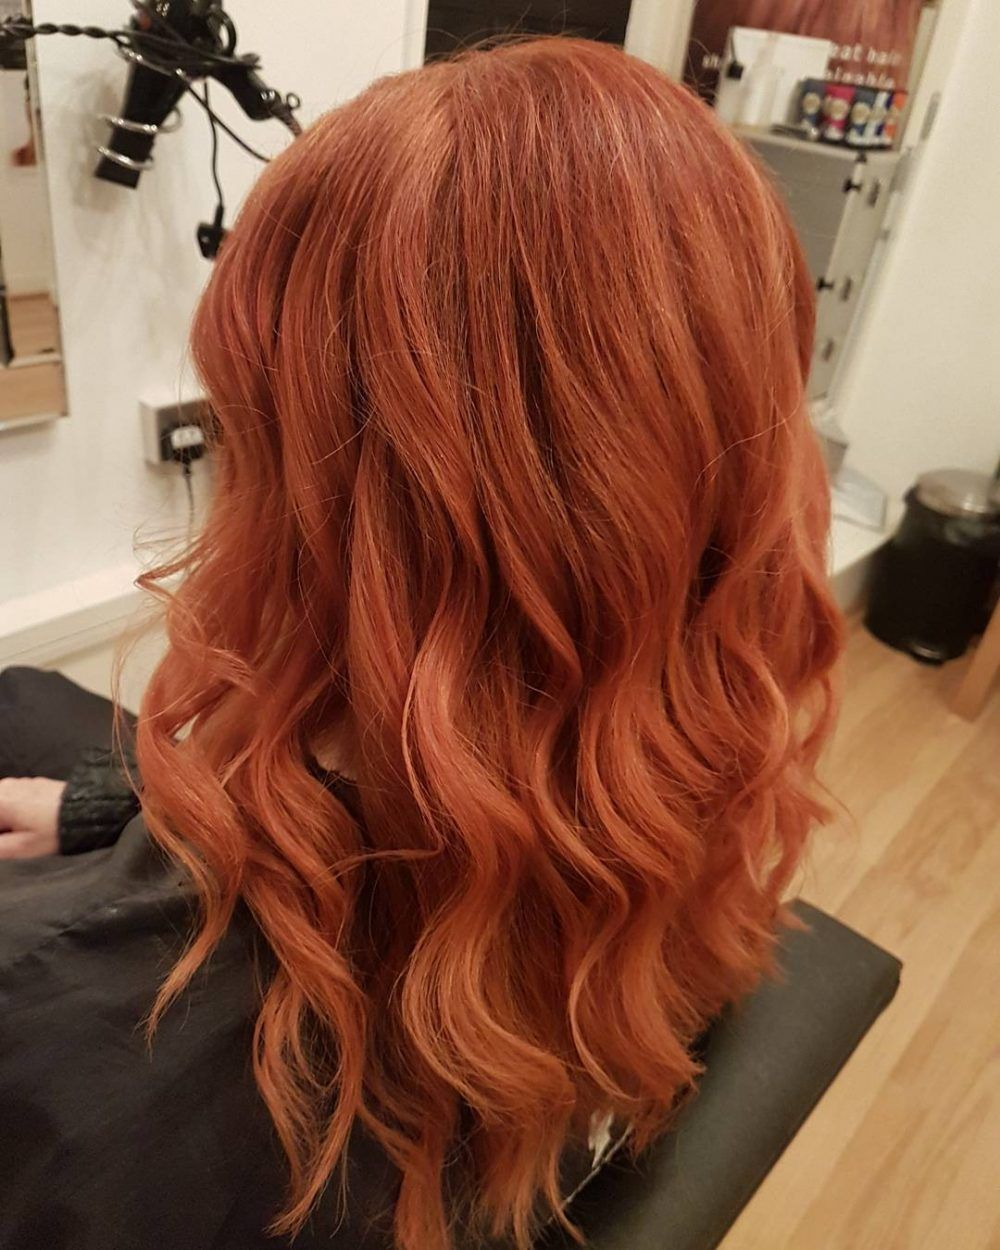 Pin On Medium Wavy Hairstyles